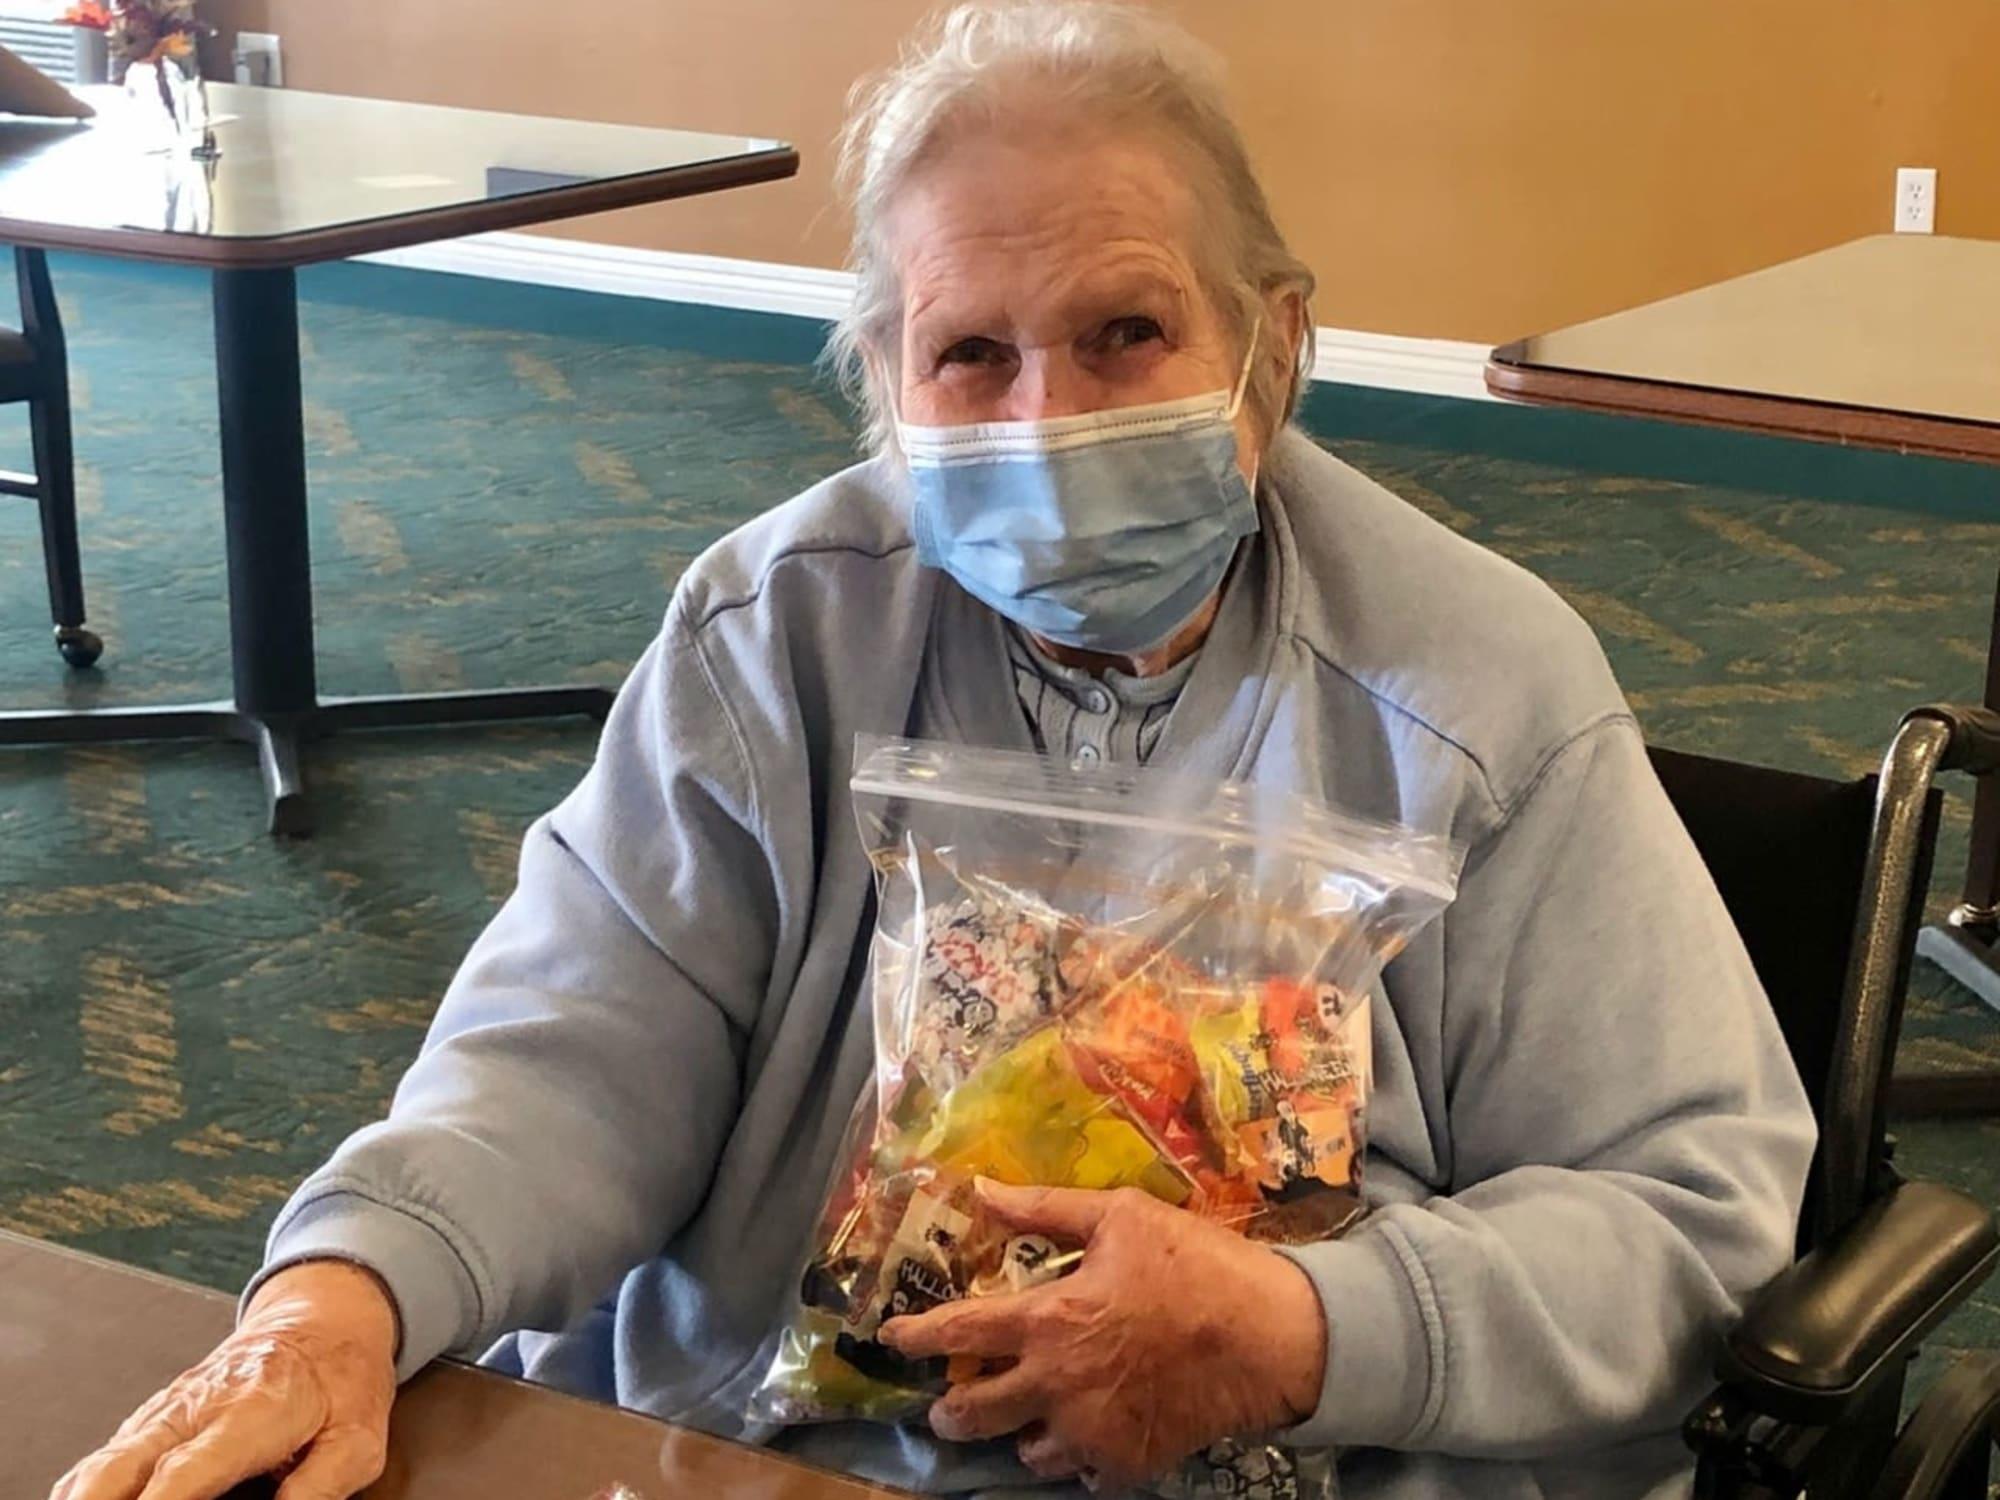 A bag of candy at The Charleston at Cedar Hills in Cedar Hills, Utah